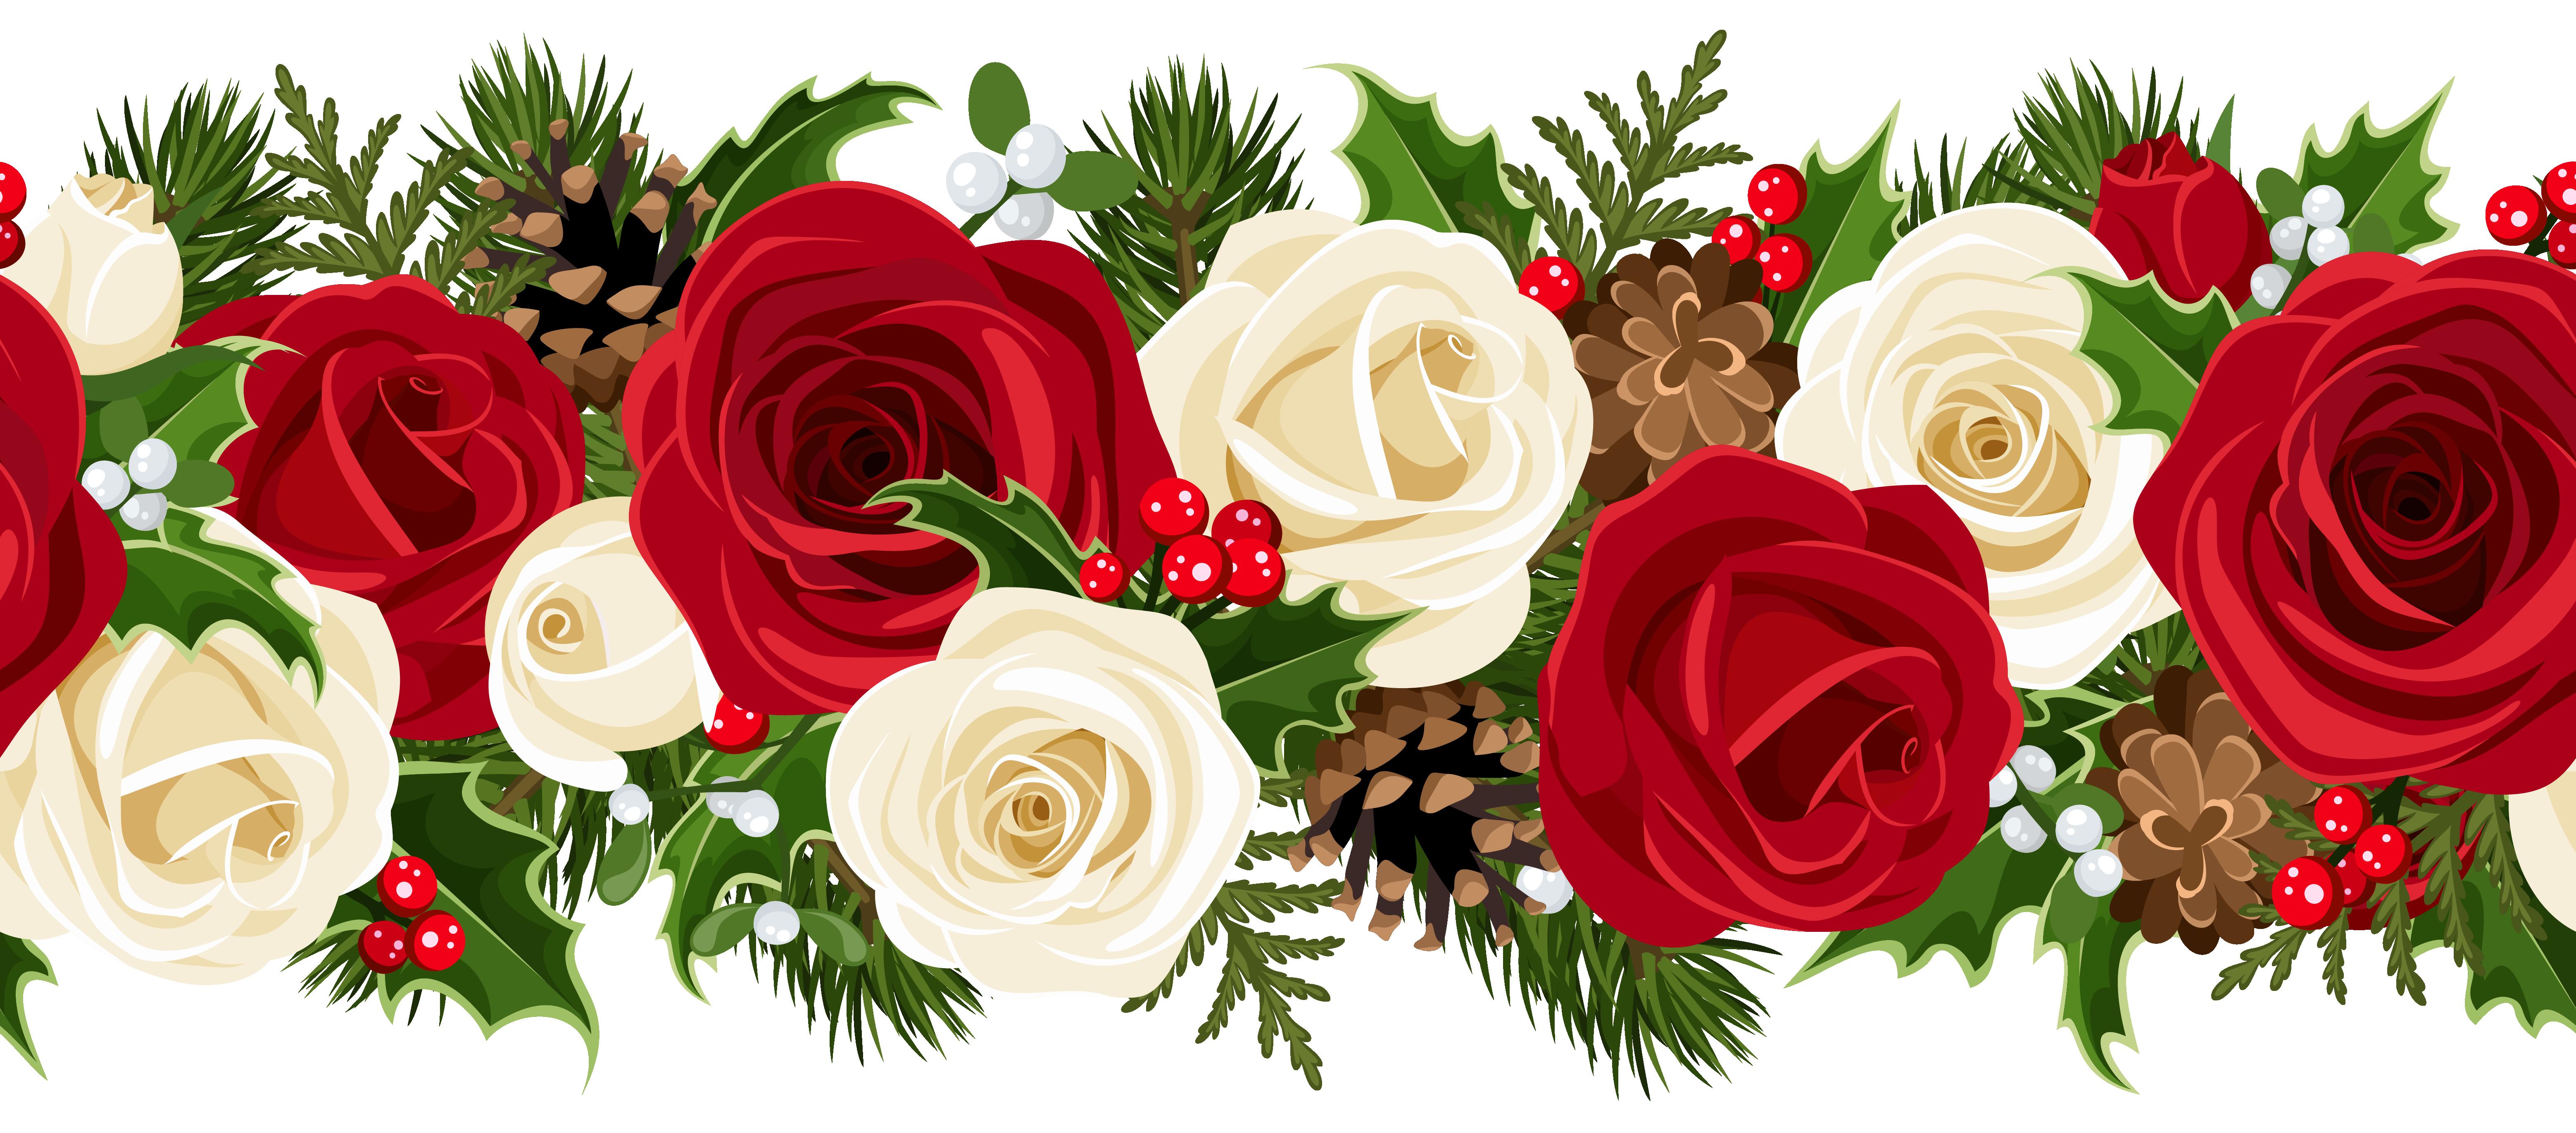 Christmas Rose Garland Png Clip Art Image Christmas Rose Christmas Boarders Christmas Decoupage